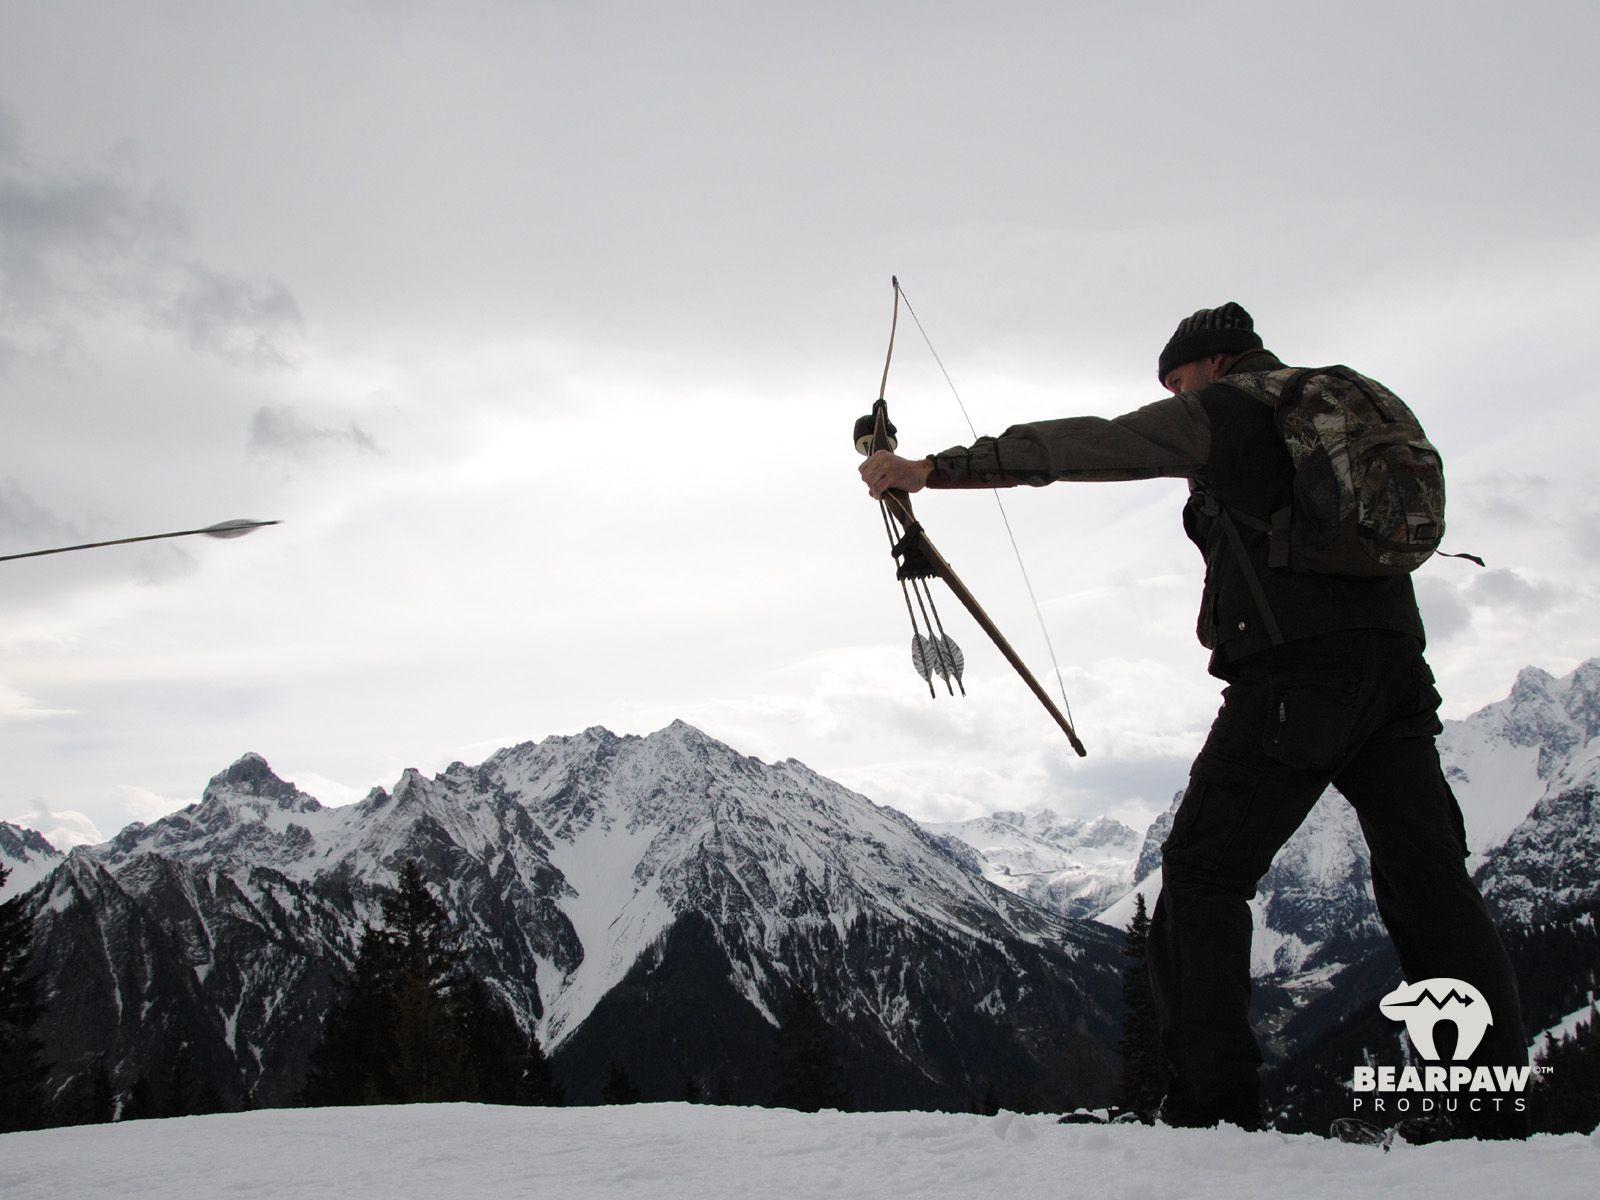 archery - Buscar con Google